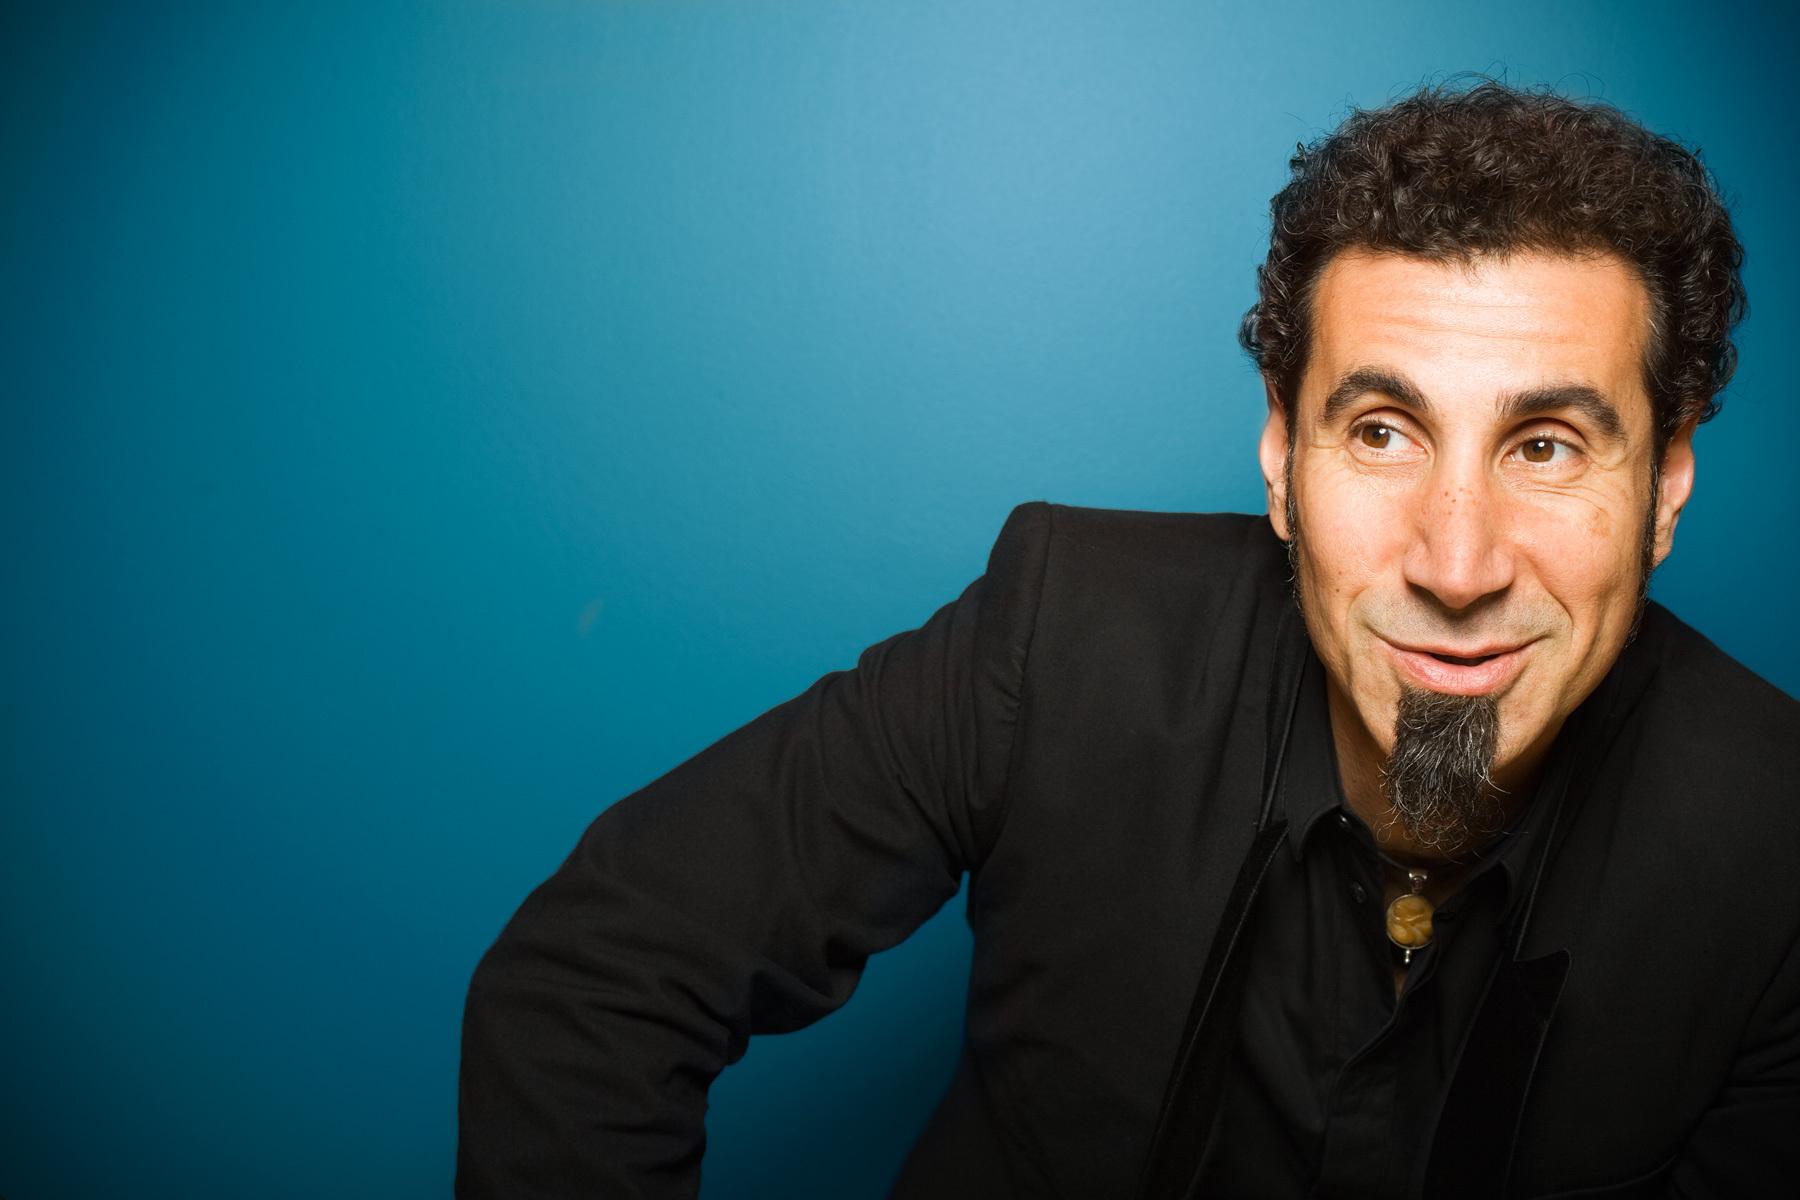 HQ Serj Tankian Wallpapers | File 360.37Kb